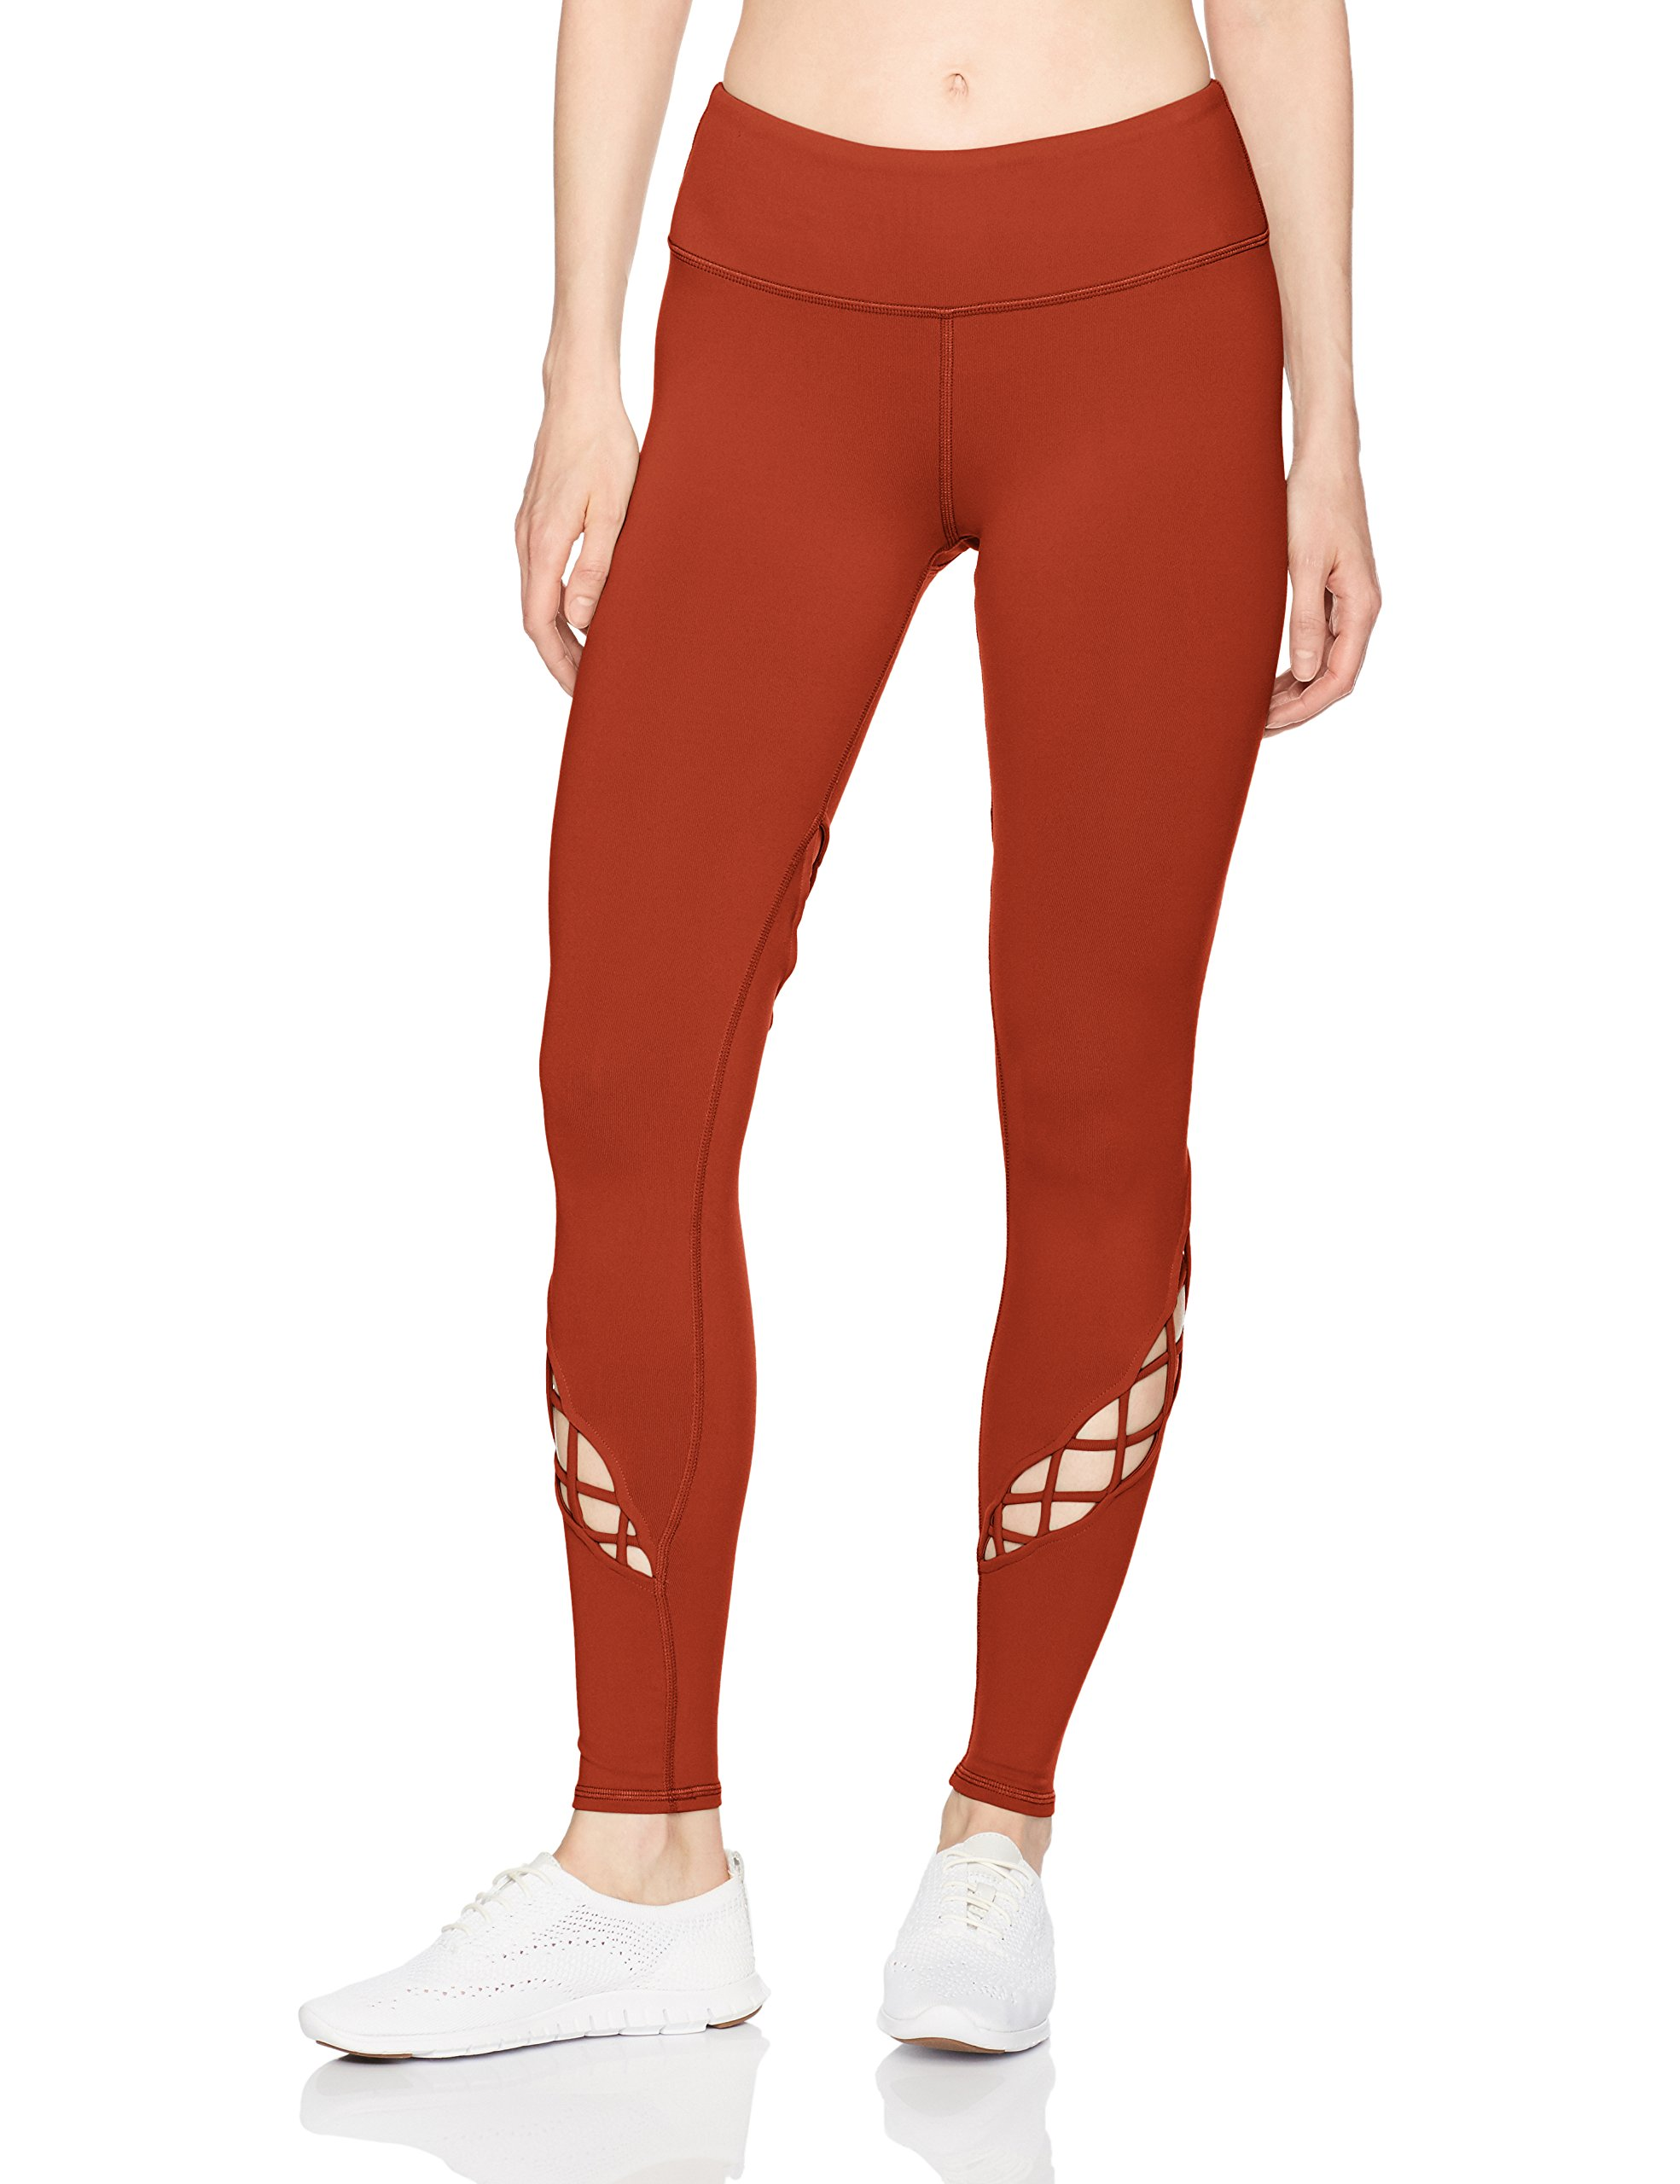 Alo Yoga Women's Entwine Legging, Amber S